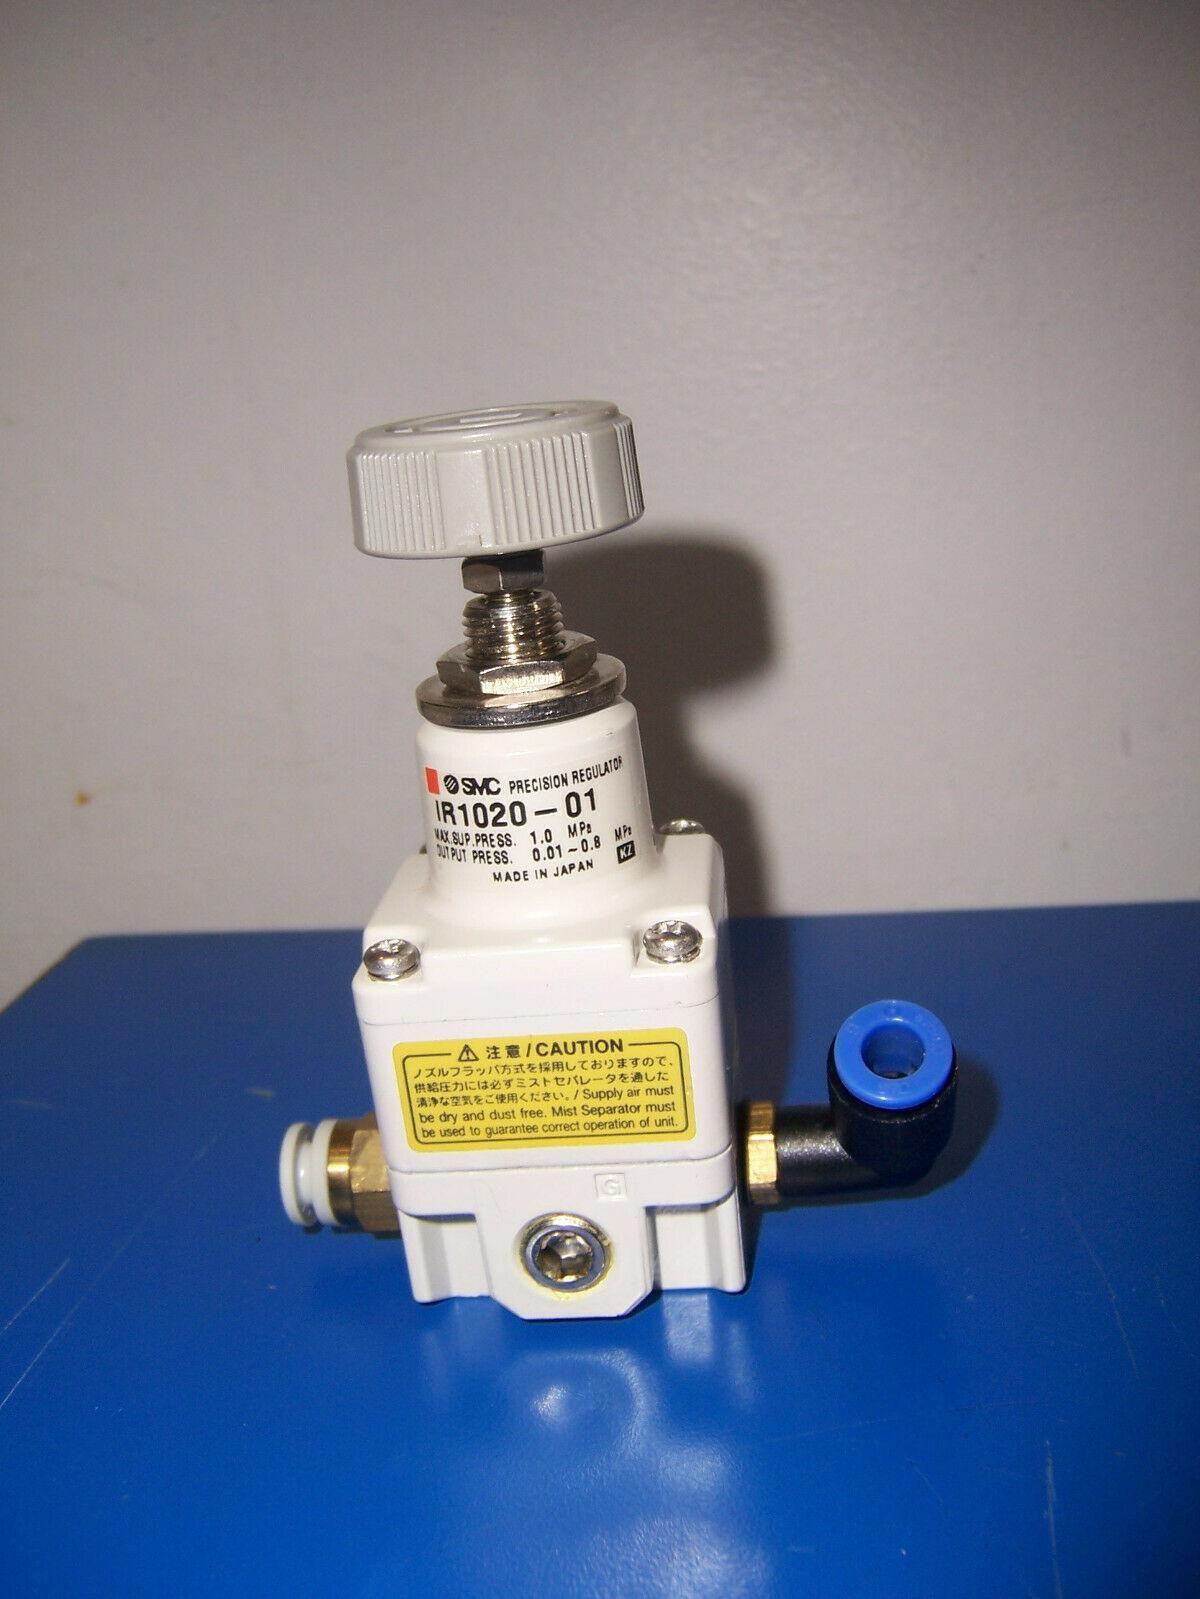 12071 SMC IR1020-01 Precision Regulator